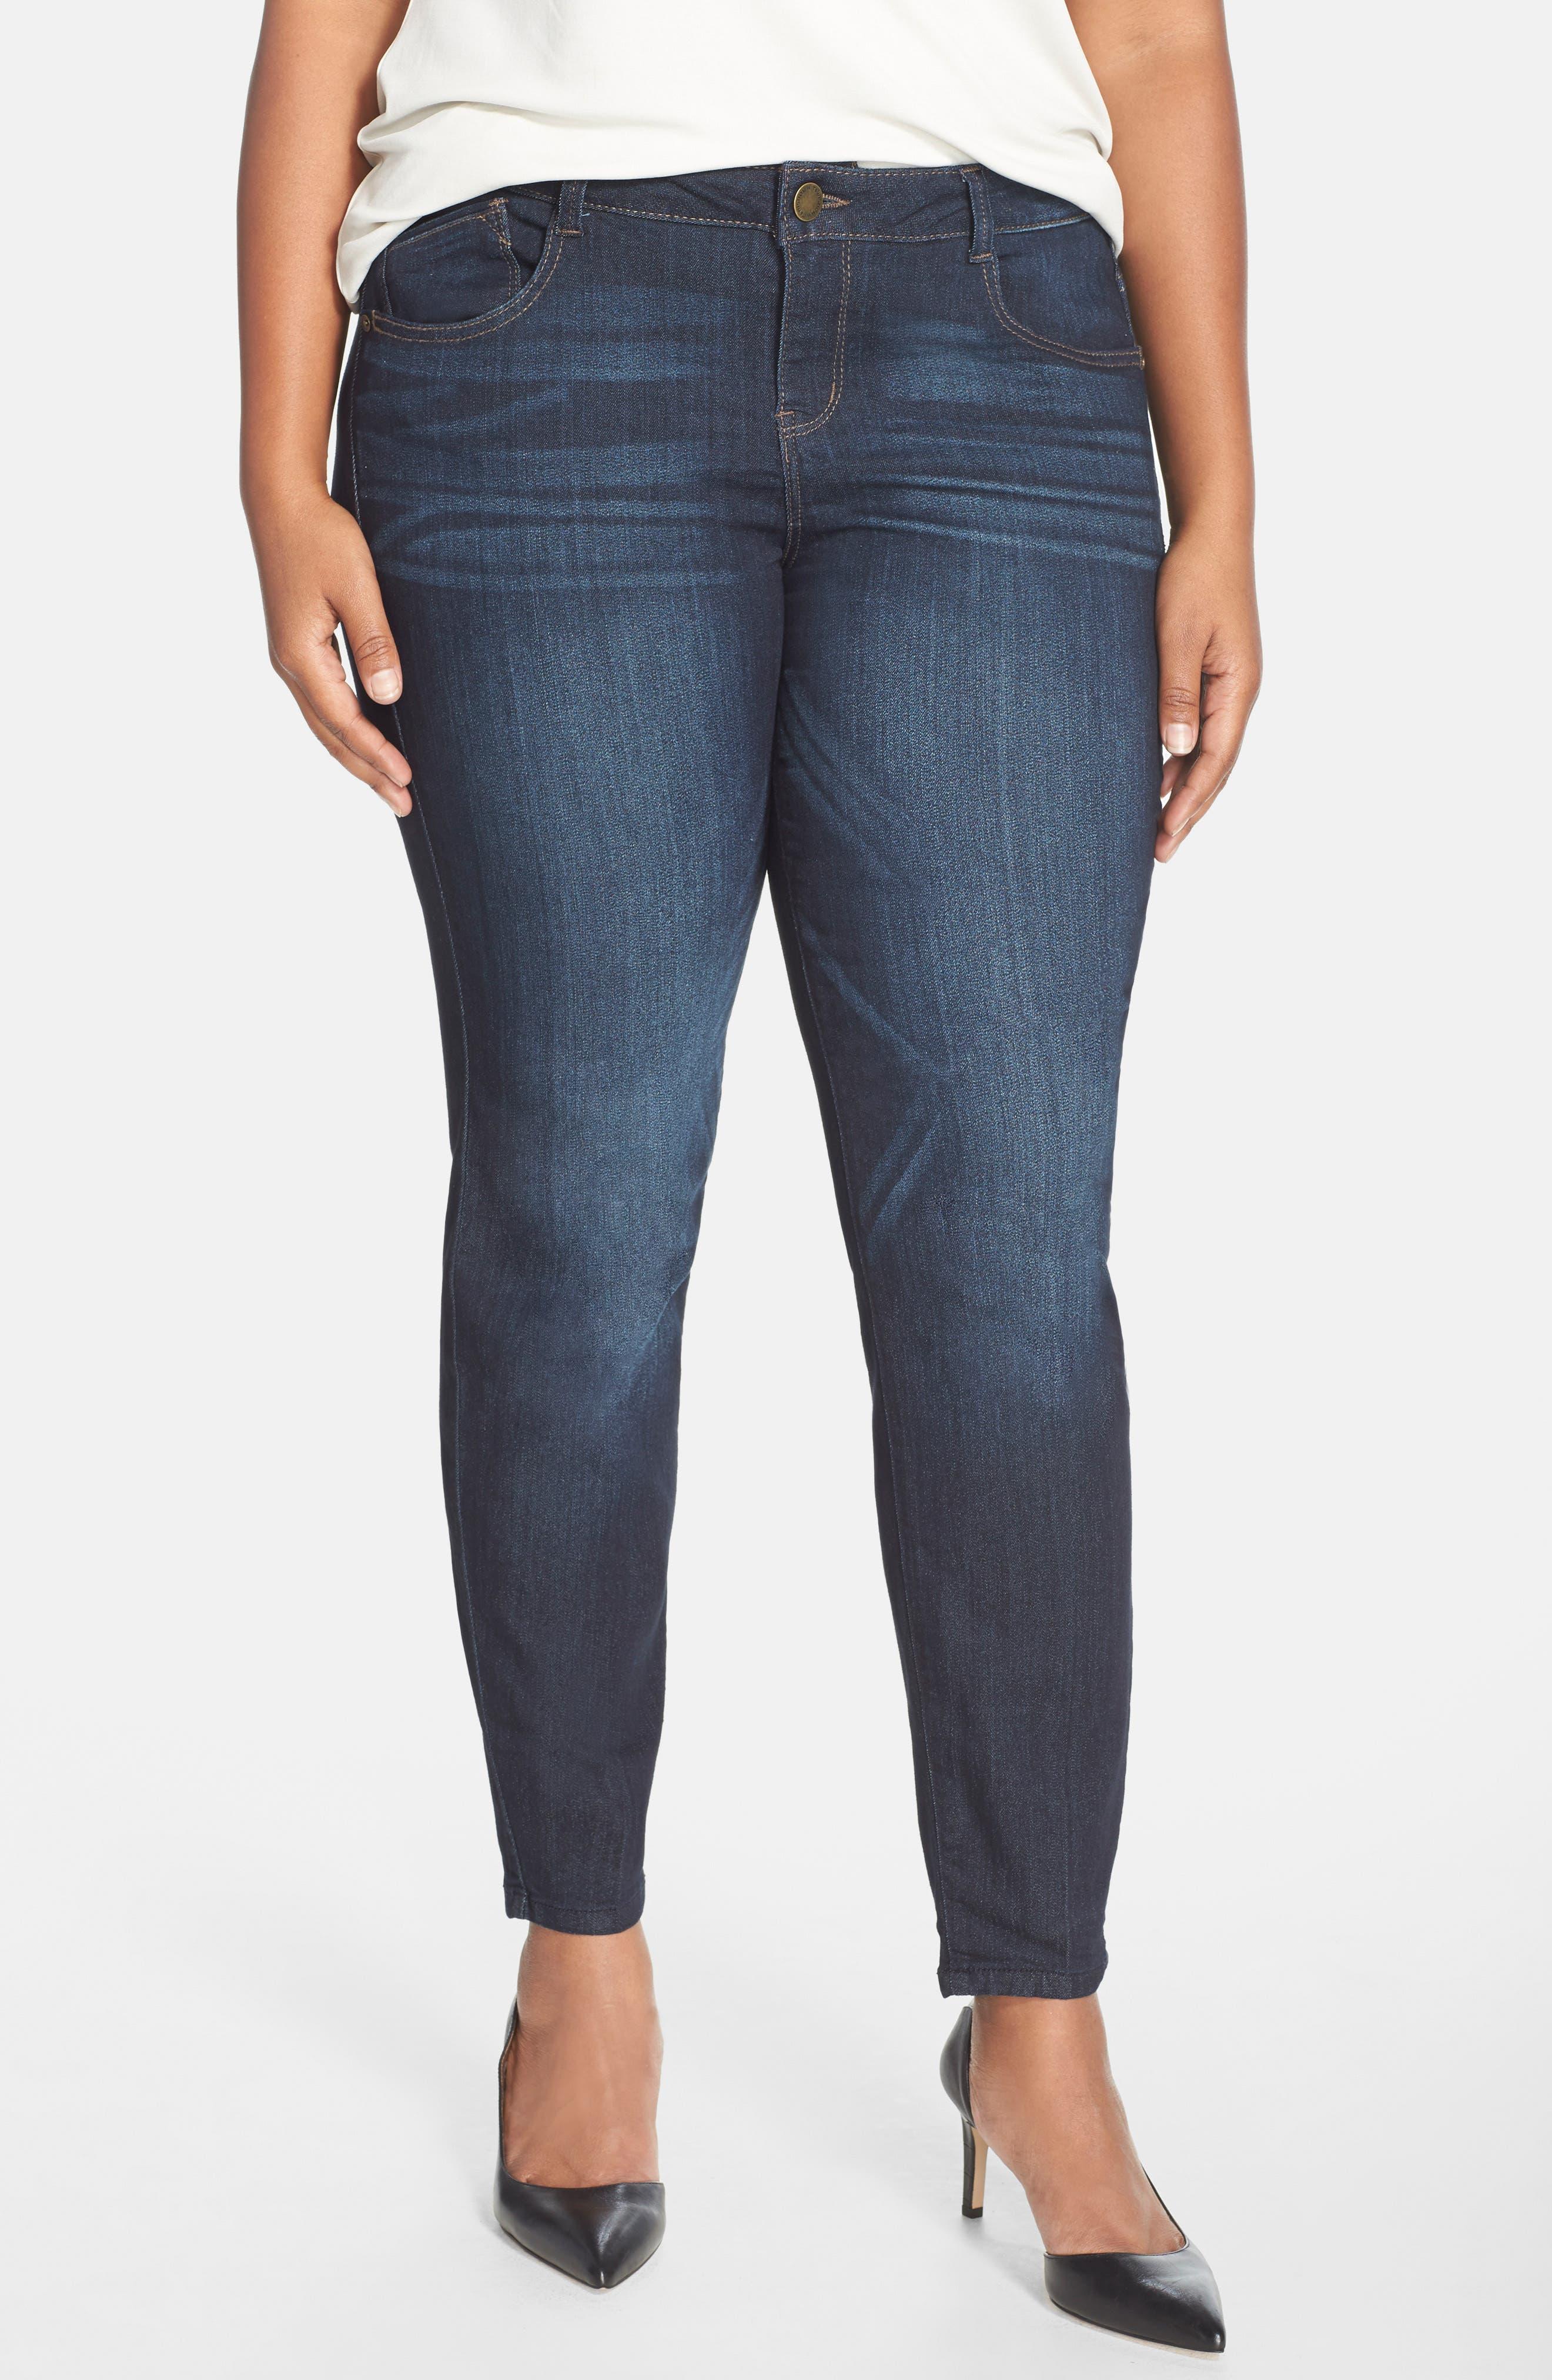 WIT & WISDOM 'Super Smooth' Stretch Skinny Jeans, Main, color, DARK NAVY